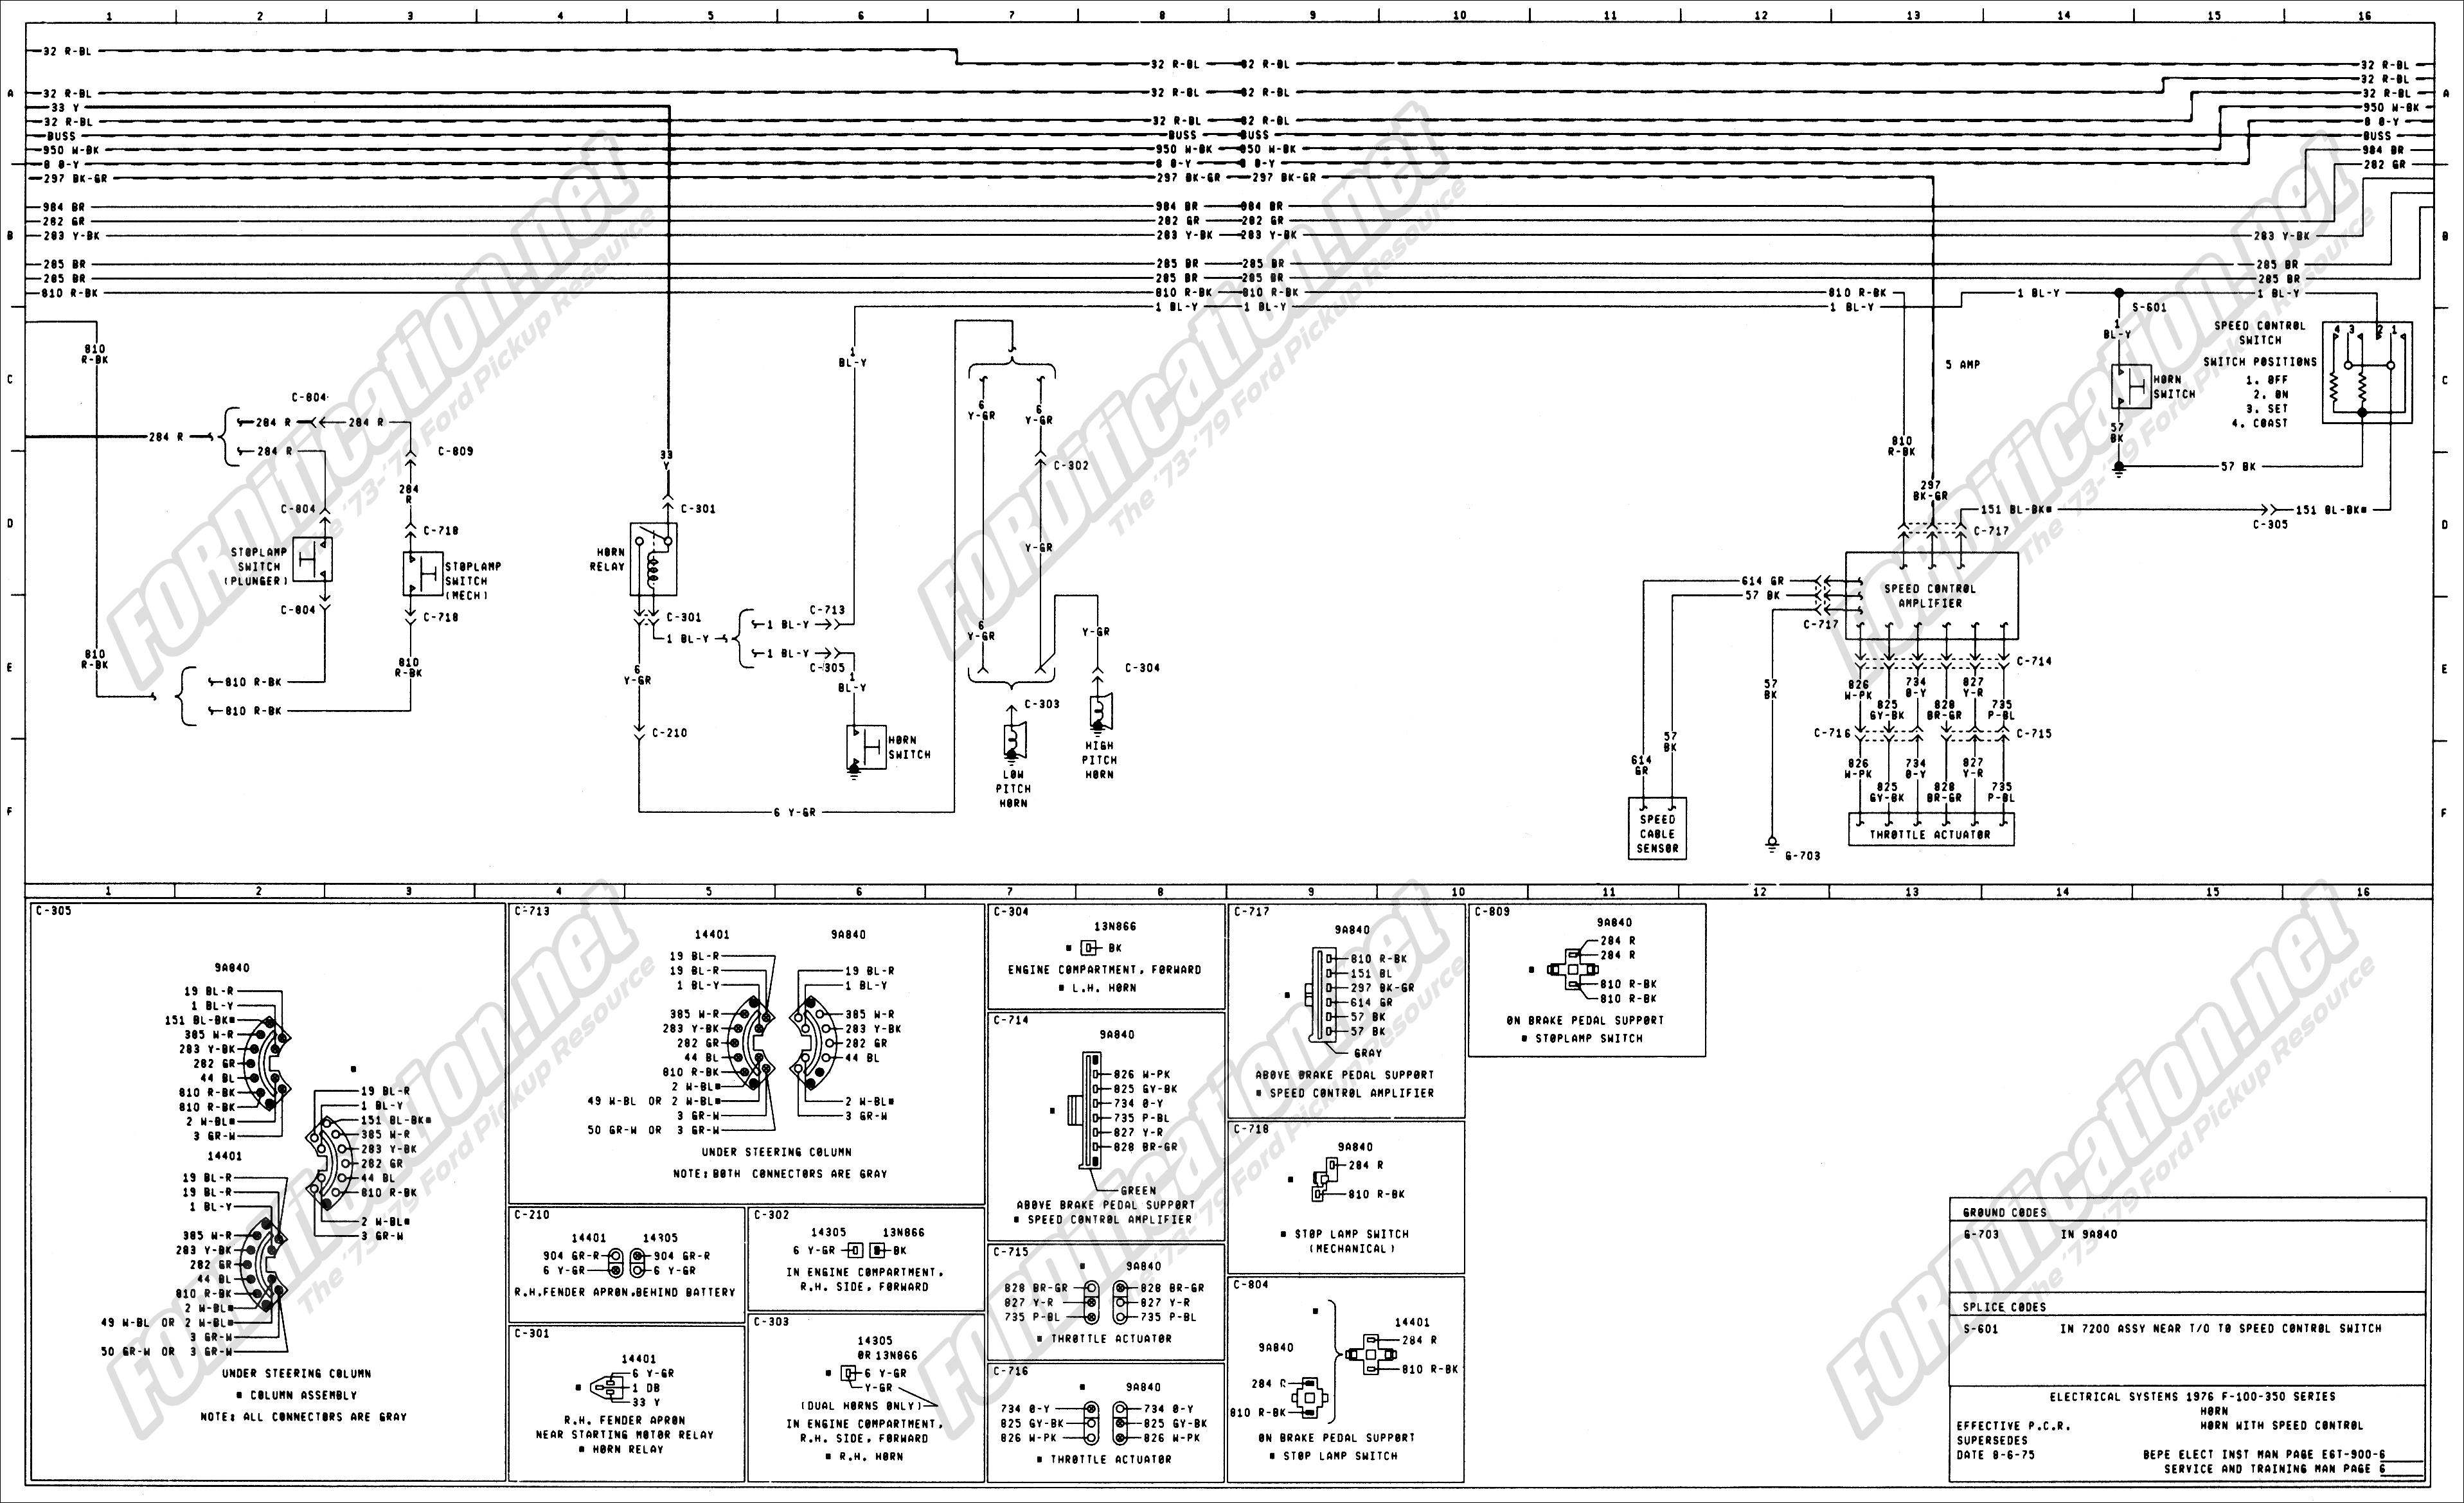 [FPER_4992]  GH_1833] 77 Ford F 150 Ignition Wiring Diagram   77 Ford F 150 Ignition Wiring      Pead Inkl Over Gritea Nizat Lline Rele Mohammedshrine Librar Wiring 101